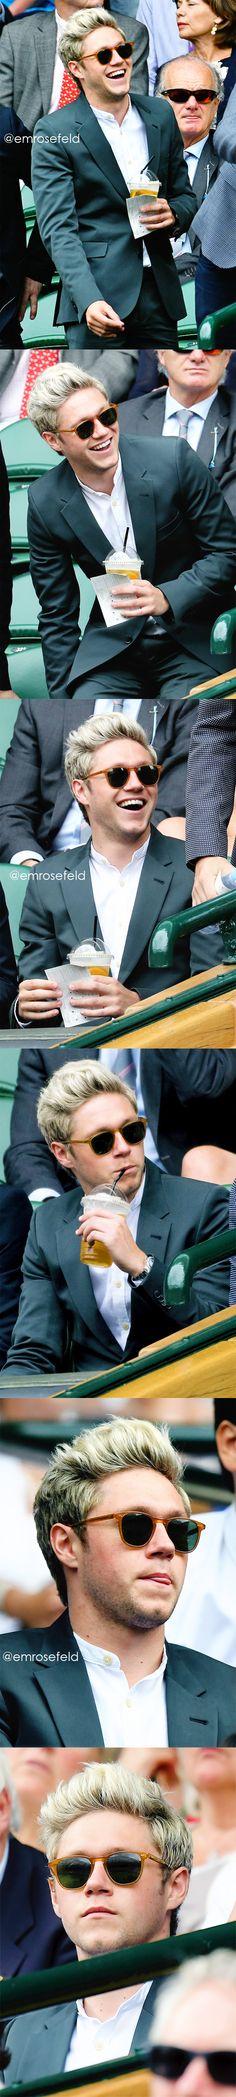 Niall Horan | Wimbledon 7.4.16 | @emrosefeld |